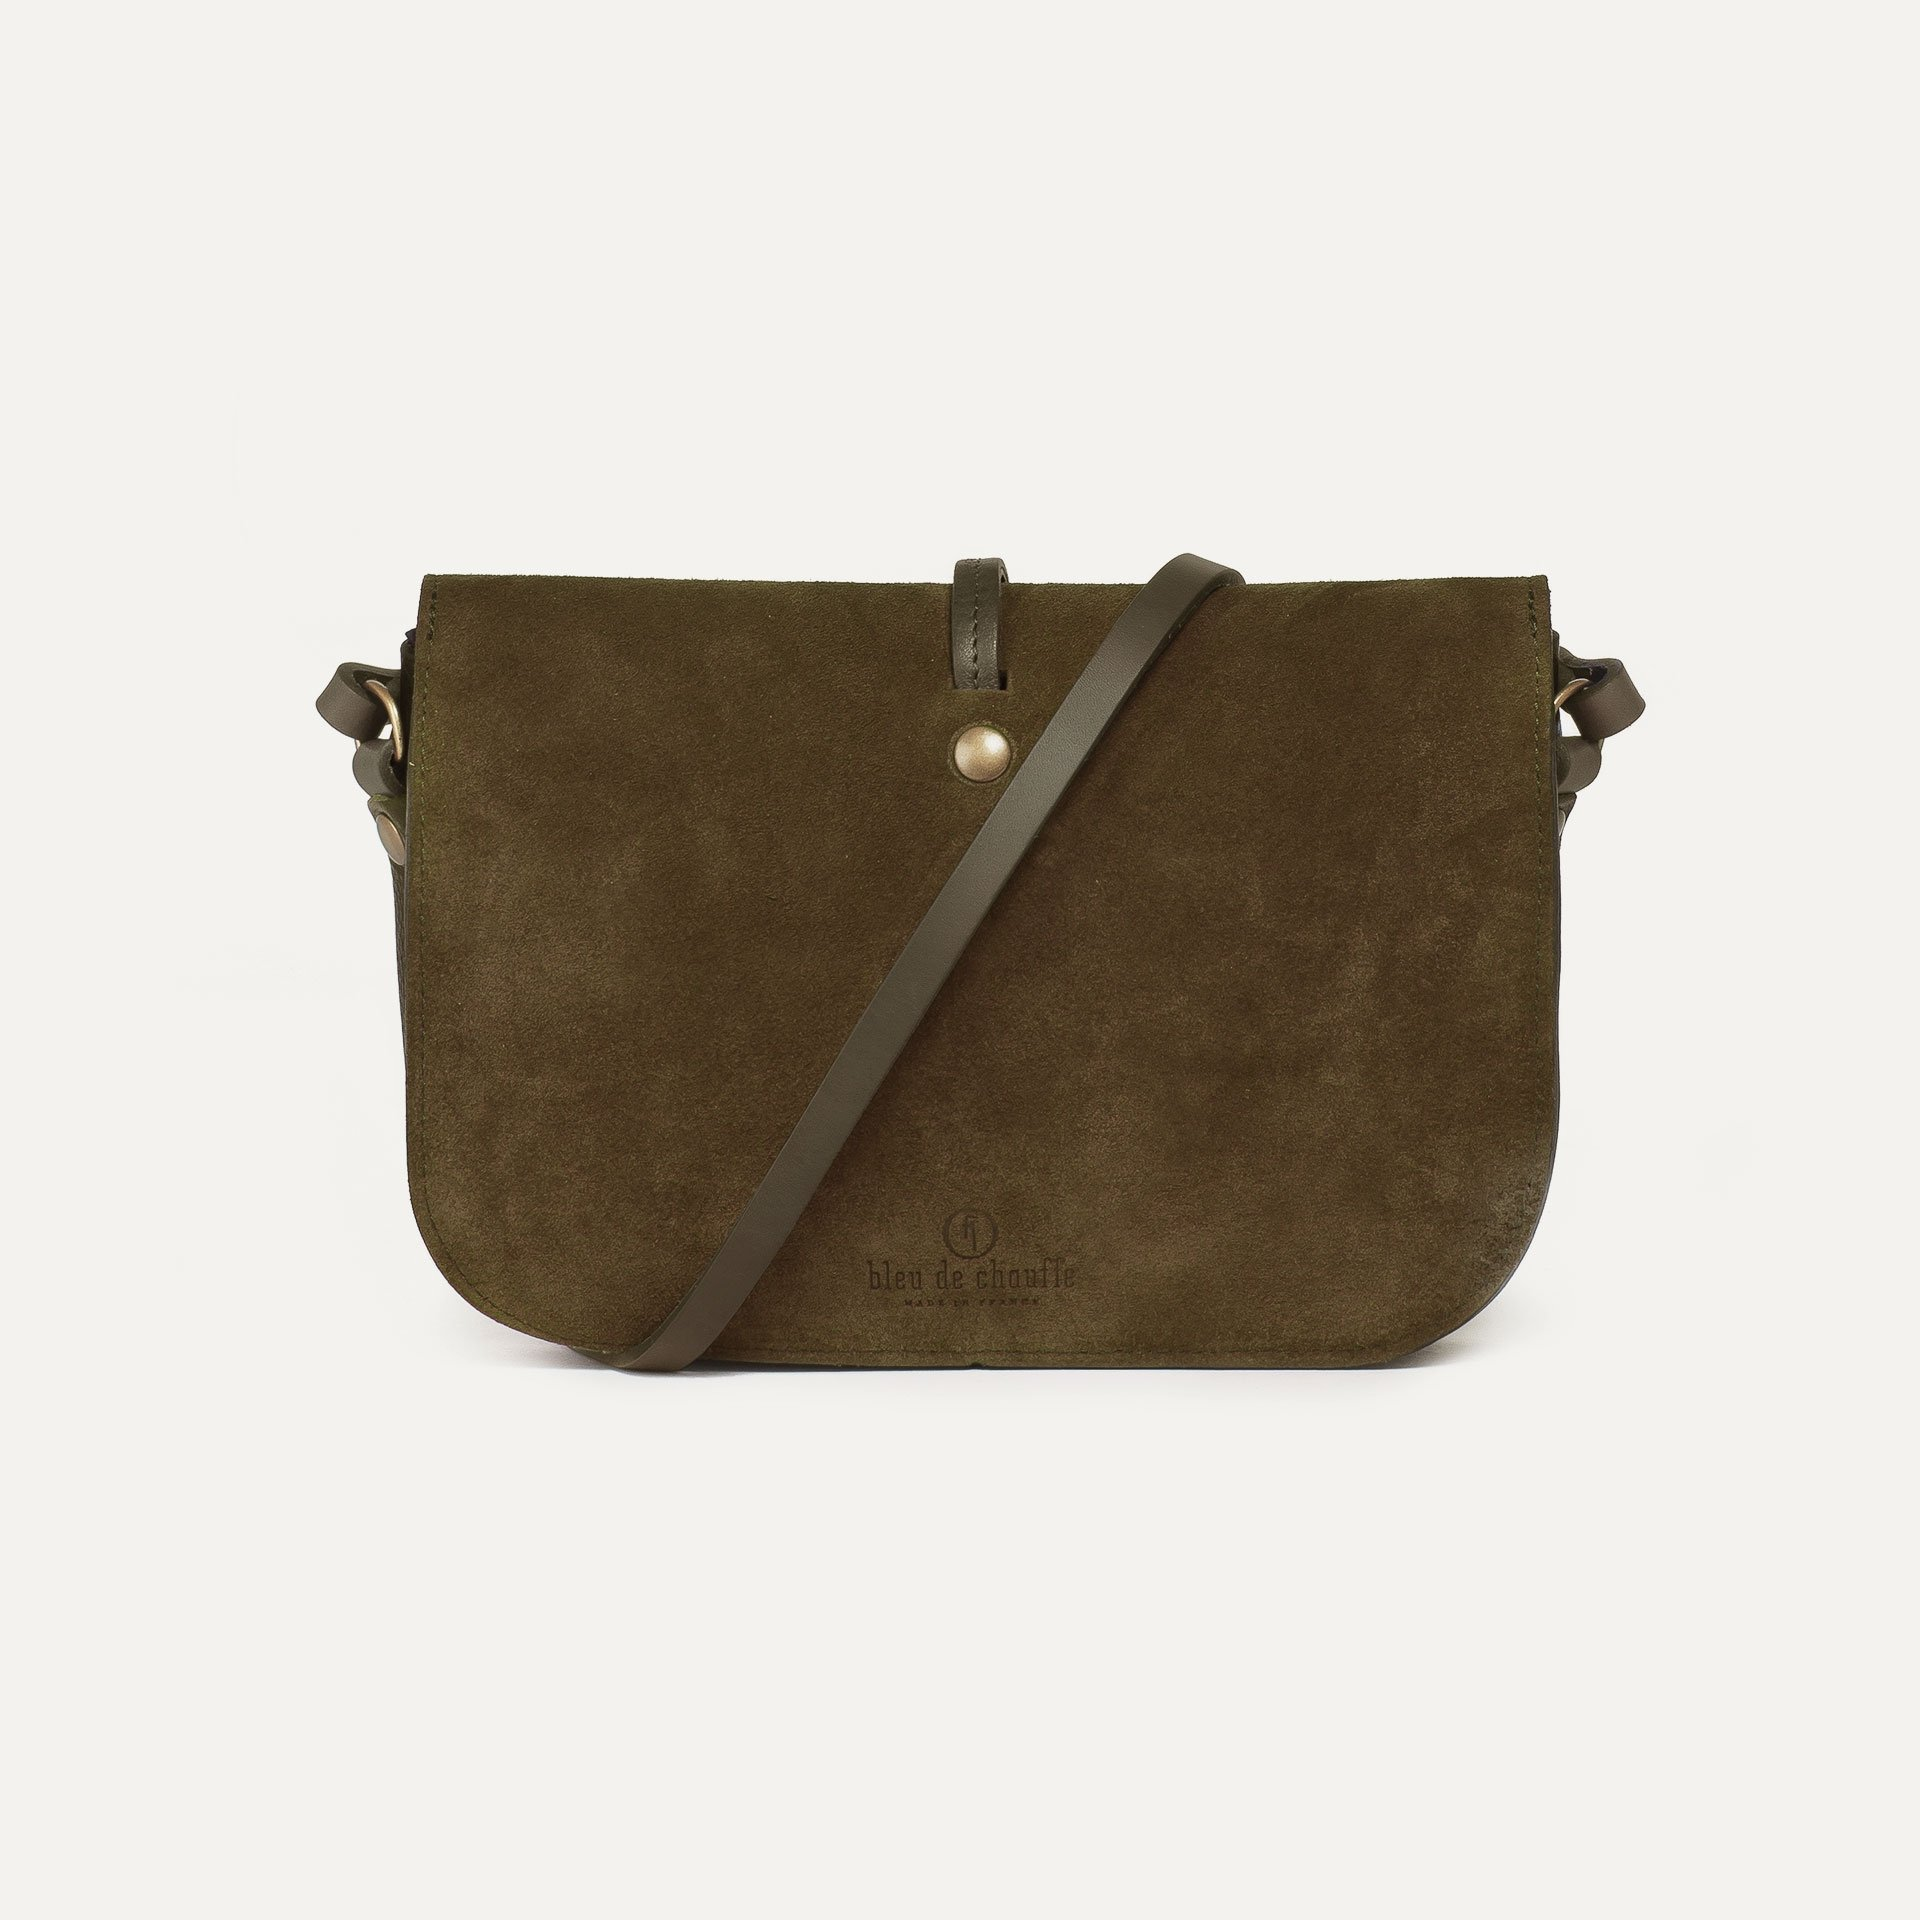 Pastis handbag - Khaki / Mix (image n°3)